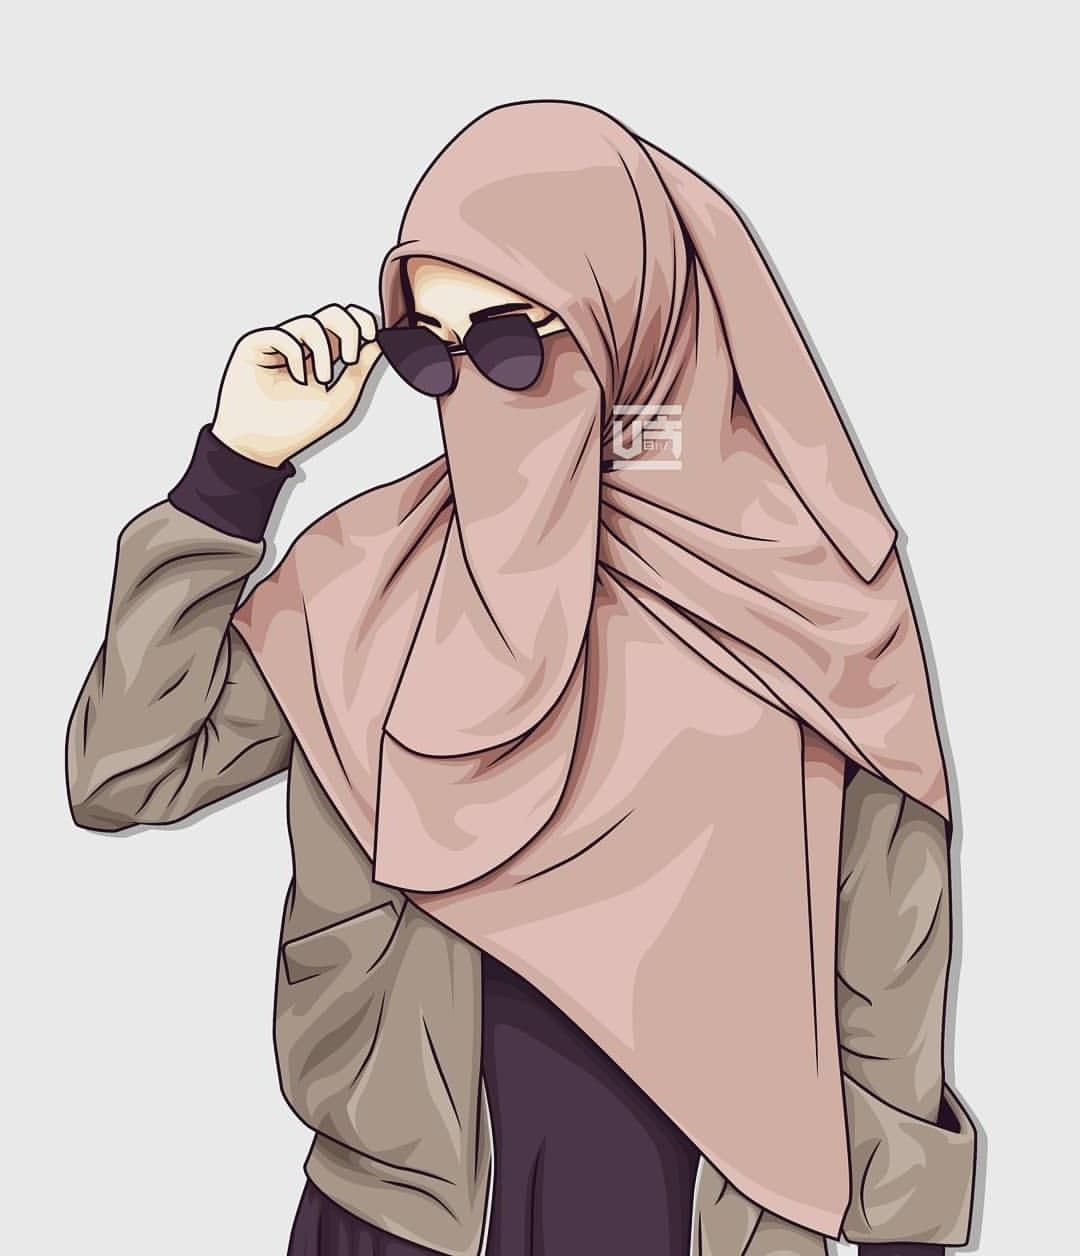 Design Muslimah Bercadar Cantik Kartun Y7du 1000 Gambar Kartun Muslimah Cantik Bercadar Kacamata El